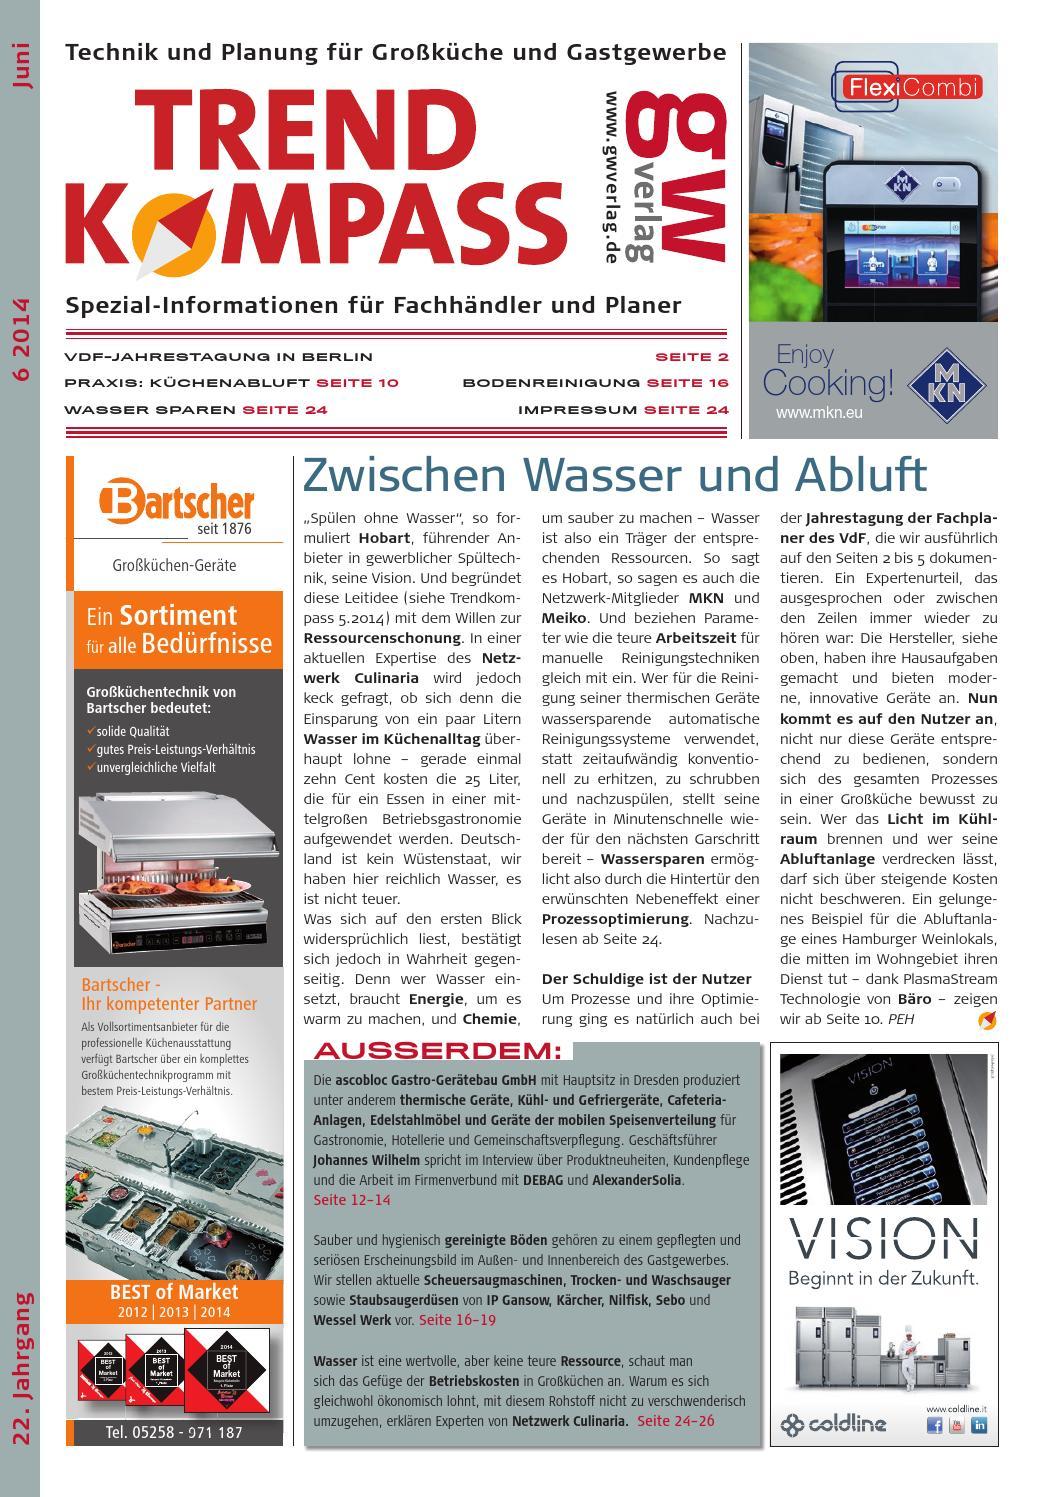 Trendkompass 6/14 by GW VERLAG - issuu